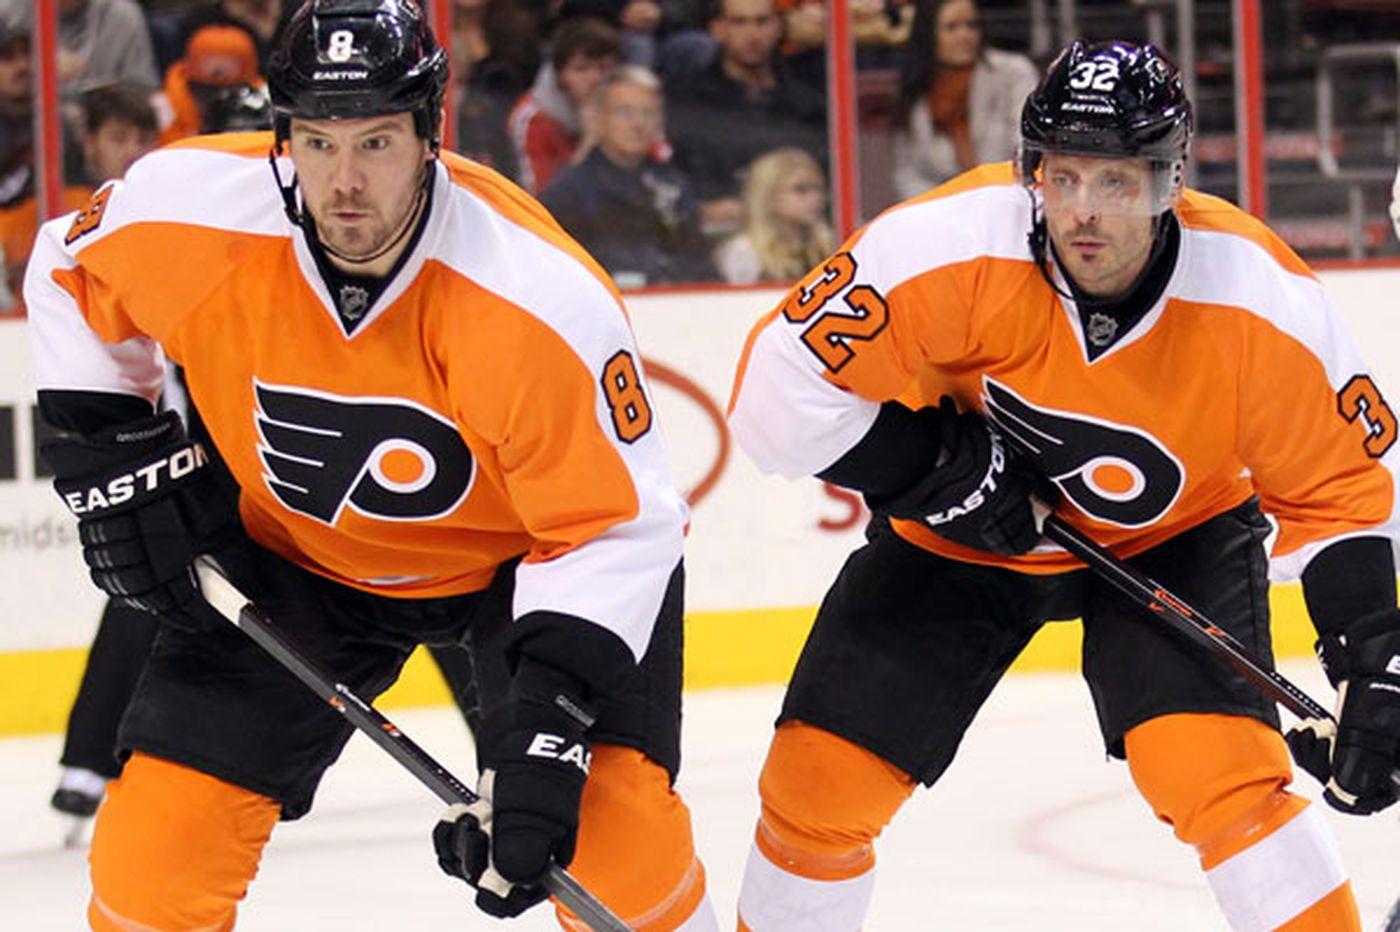 Road work ahead: Flyers begin trip in Edmonton